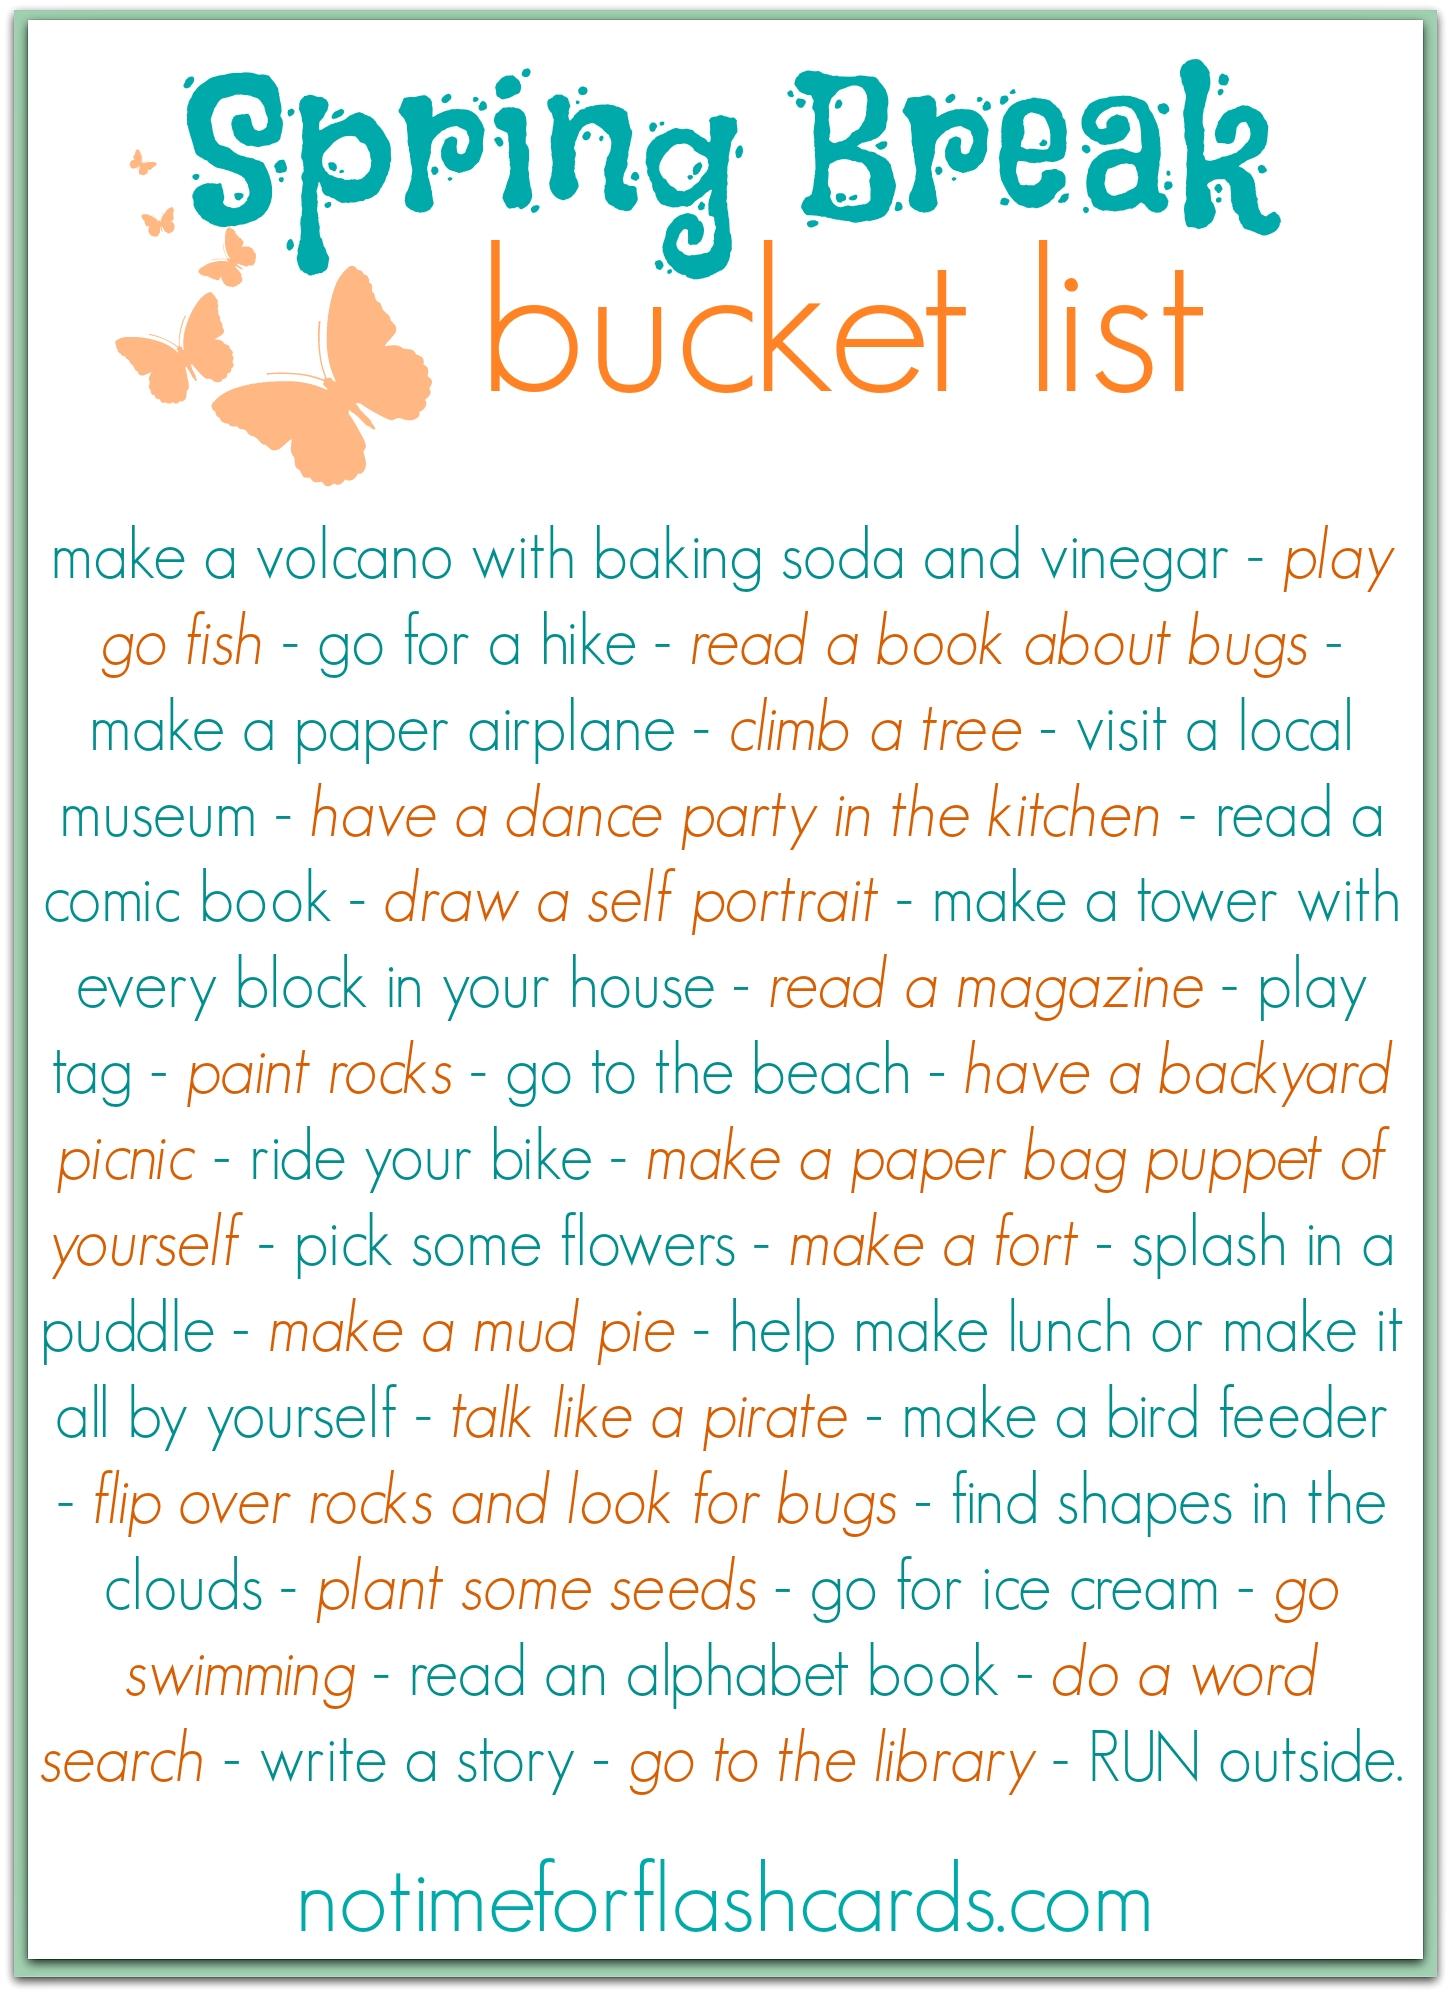 10 Attractive Spring Break Ideas For Kids spring break bucket list free printable free printable buckets 2021